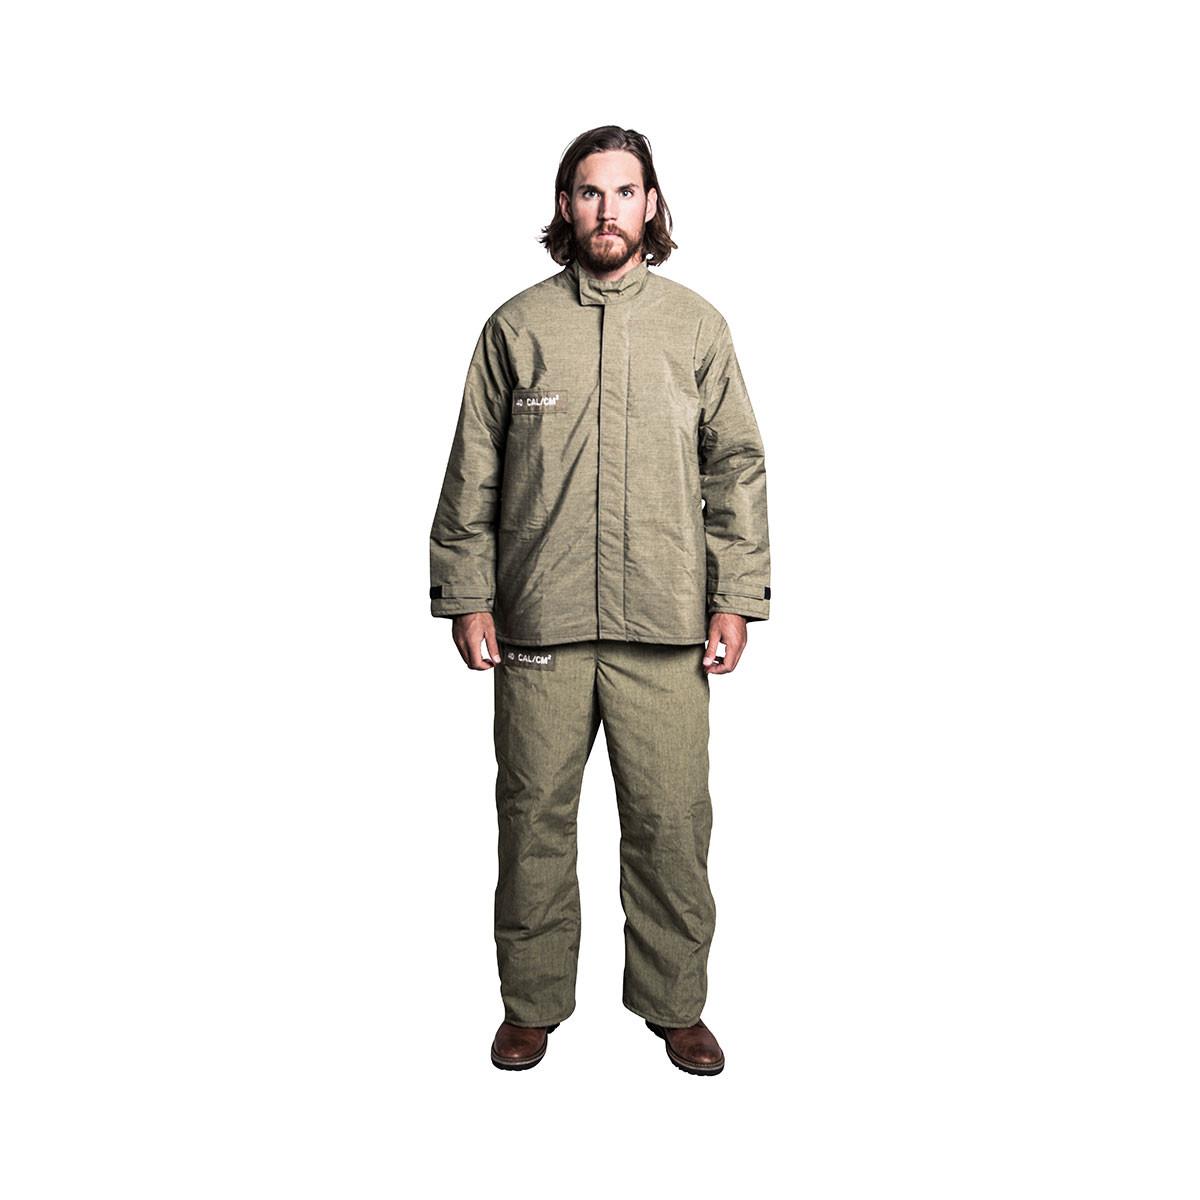 40 Cal Premium Jacket